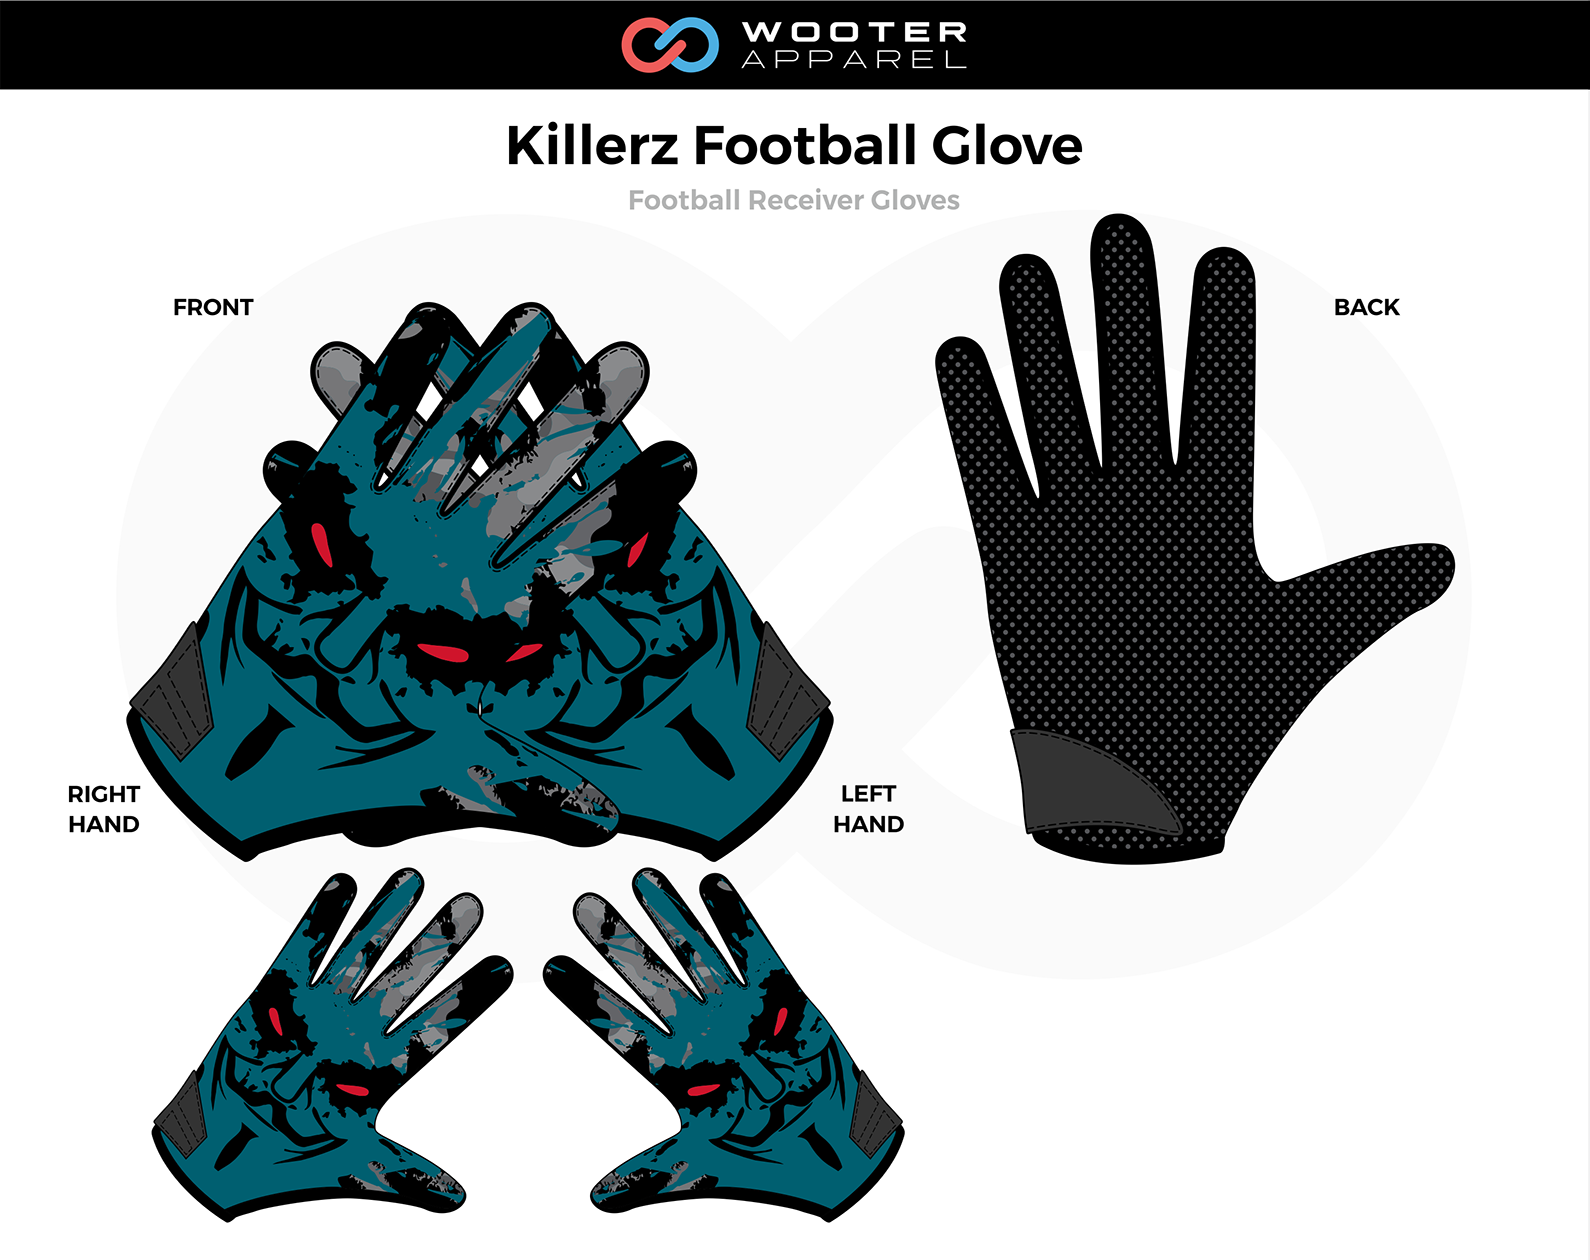 2019-04-01 Killerz Football Glove 2.png